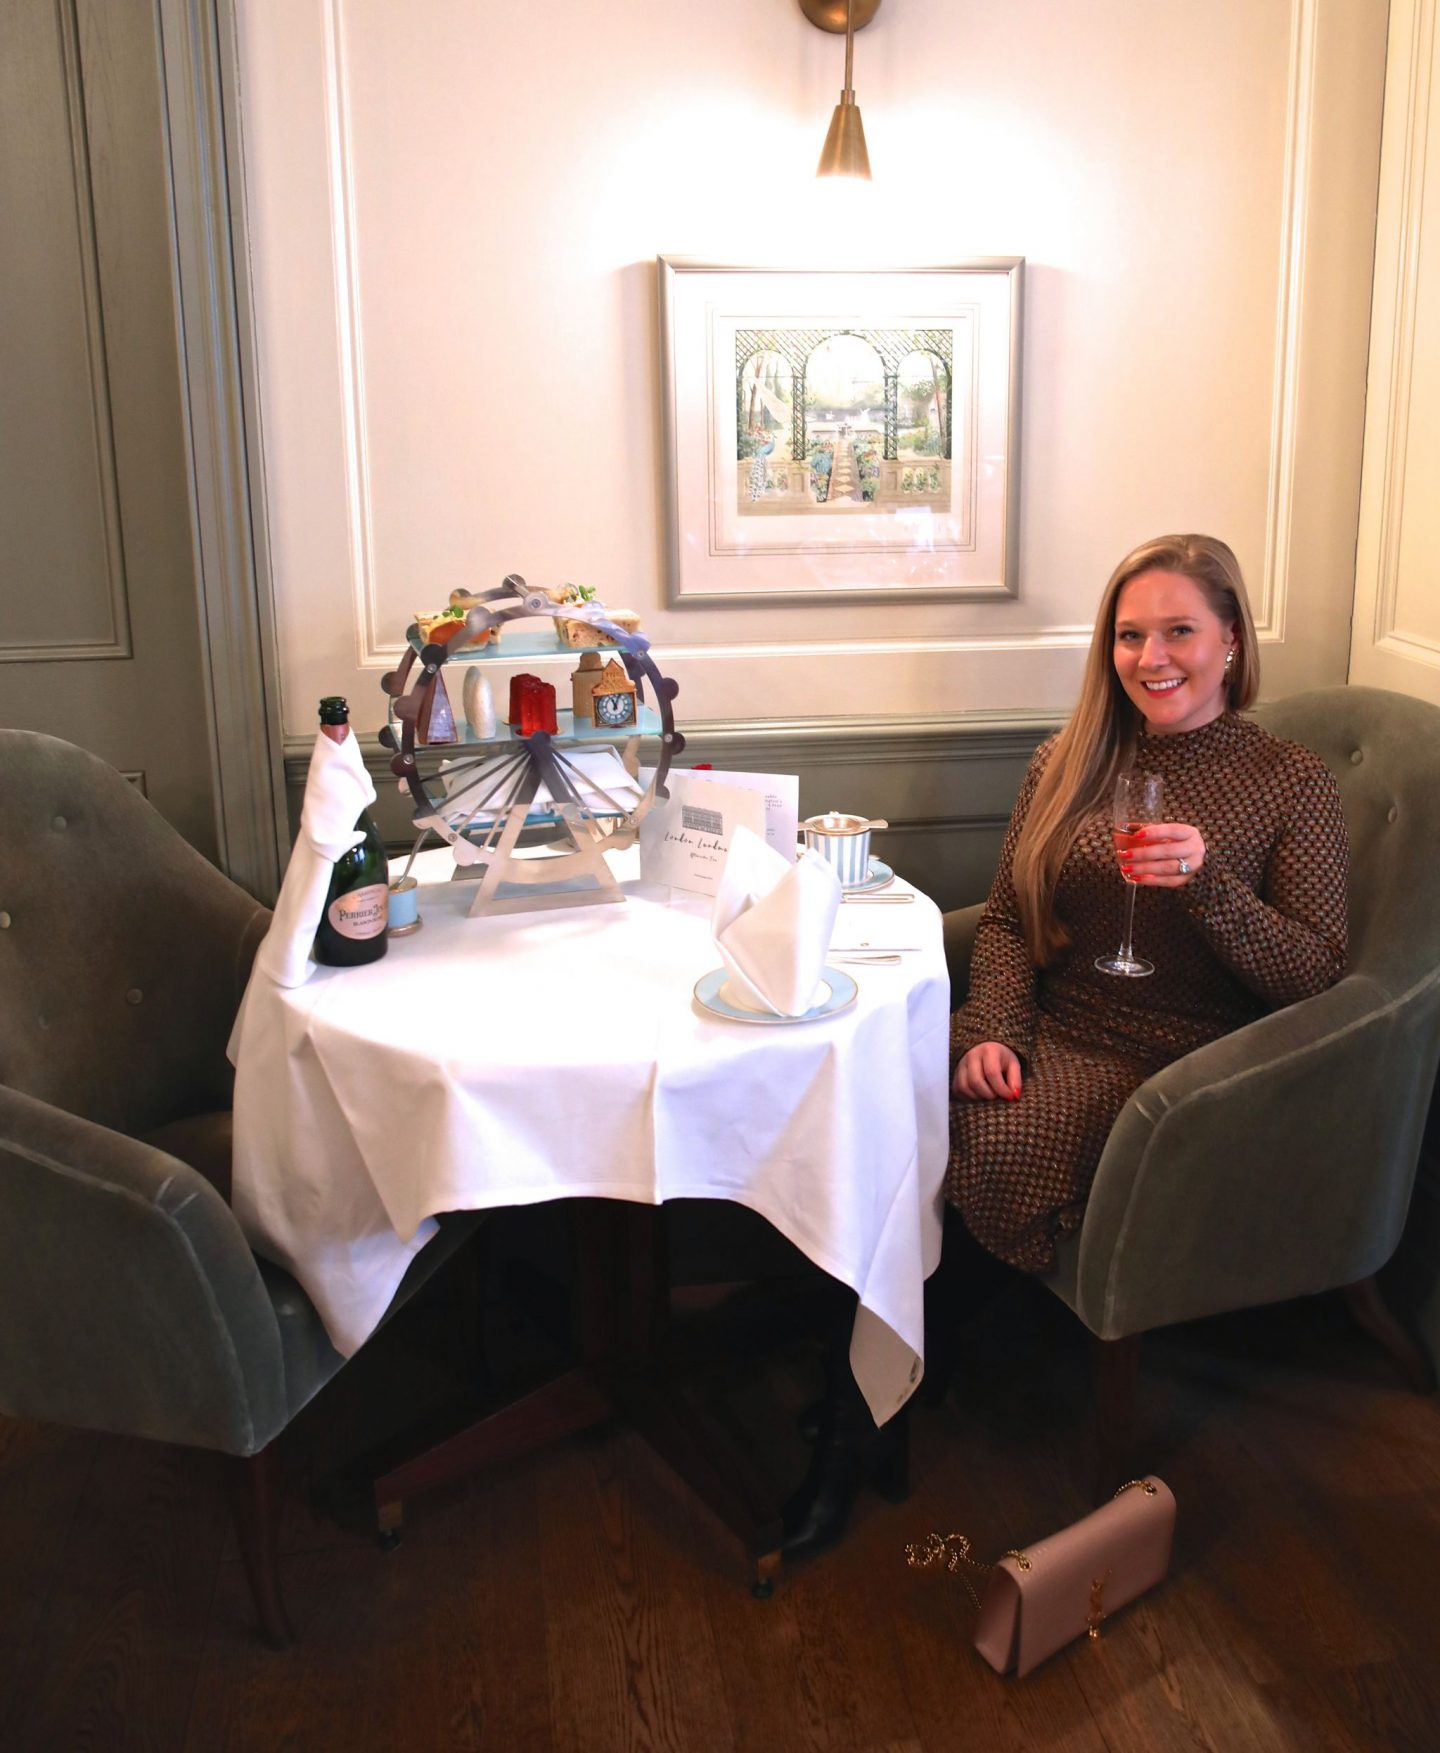 The Kensington Townhouse's London Landmarks Afternoon Tea